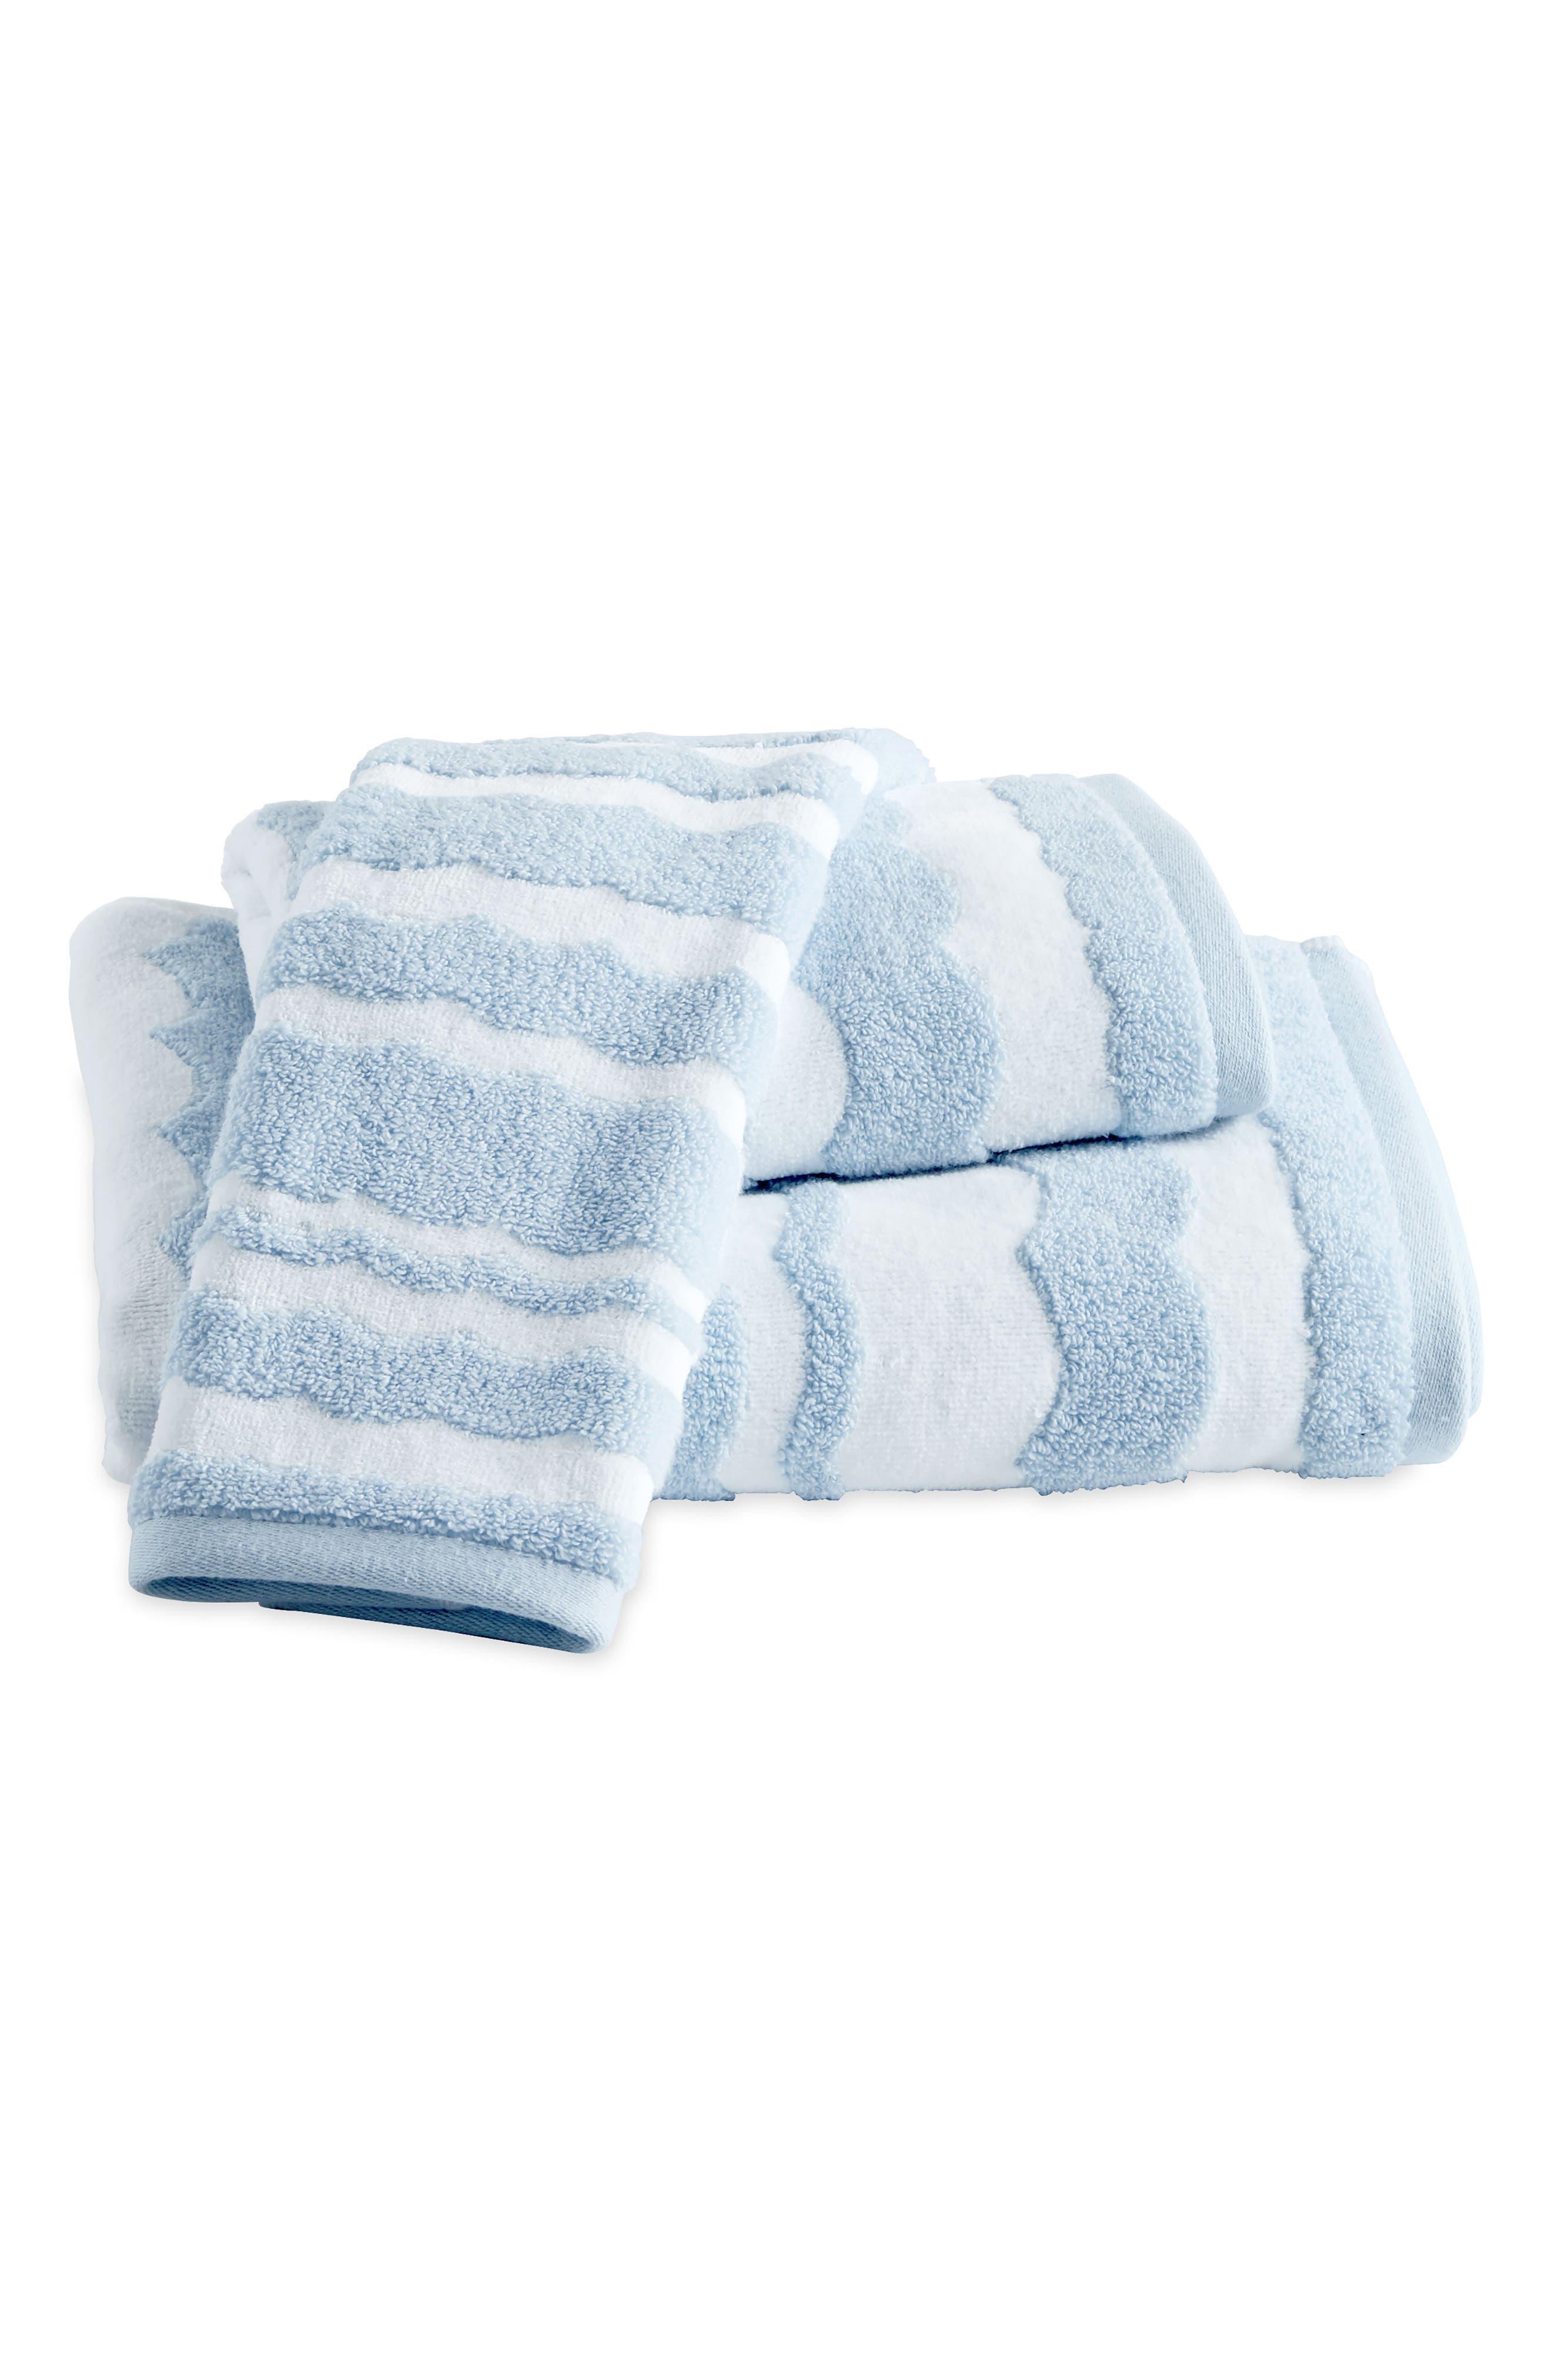 Wave Scallop Bath Towel, Hand Towel and Tip Towel Set,                             Main thumbnail 1, color,                             Blue